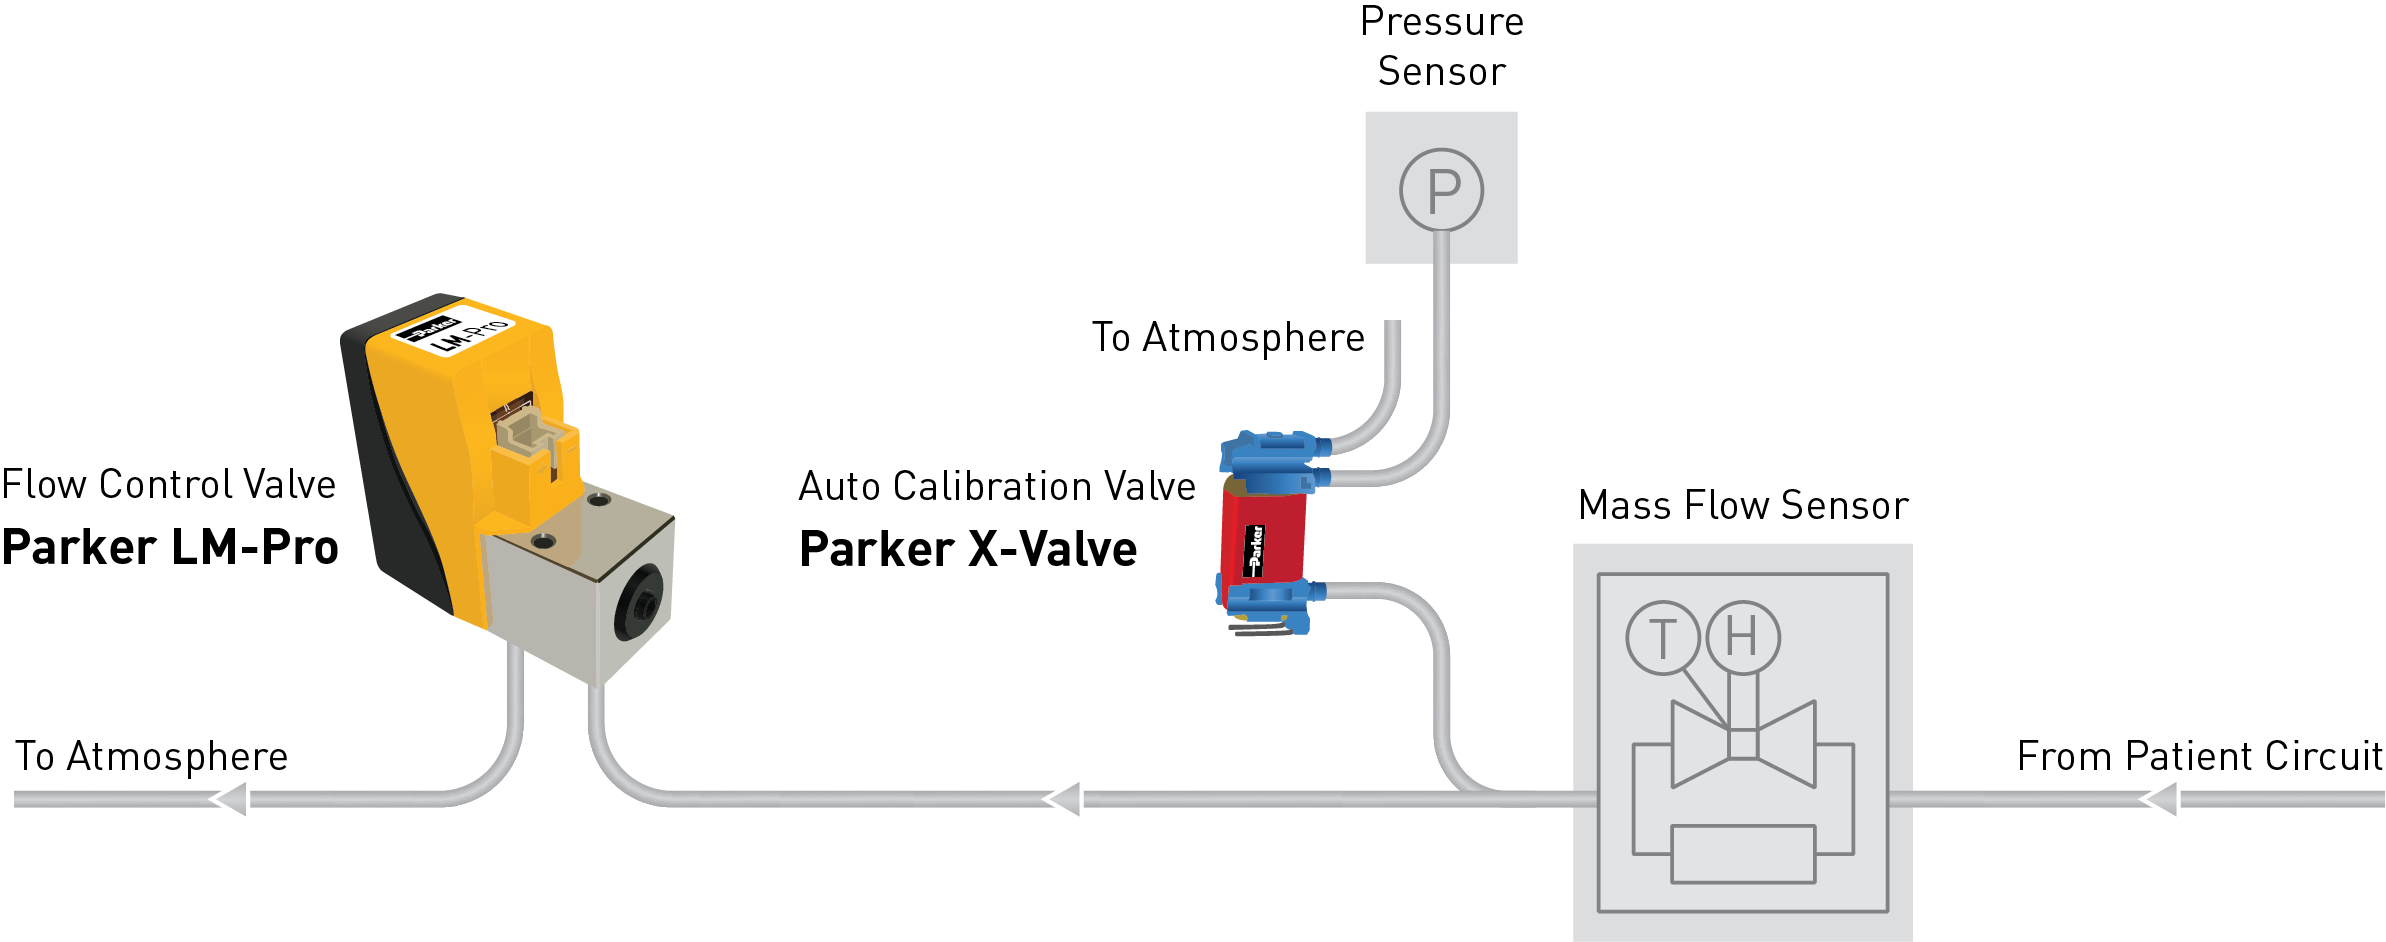 Parker Precision Fluidics LM-Pro Miniature Proportional Ventilator Inspiratory Flow Diagram